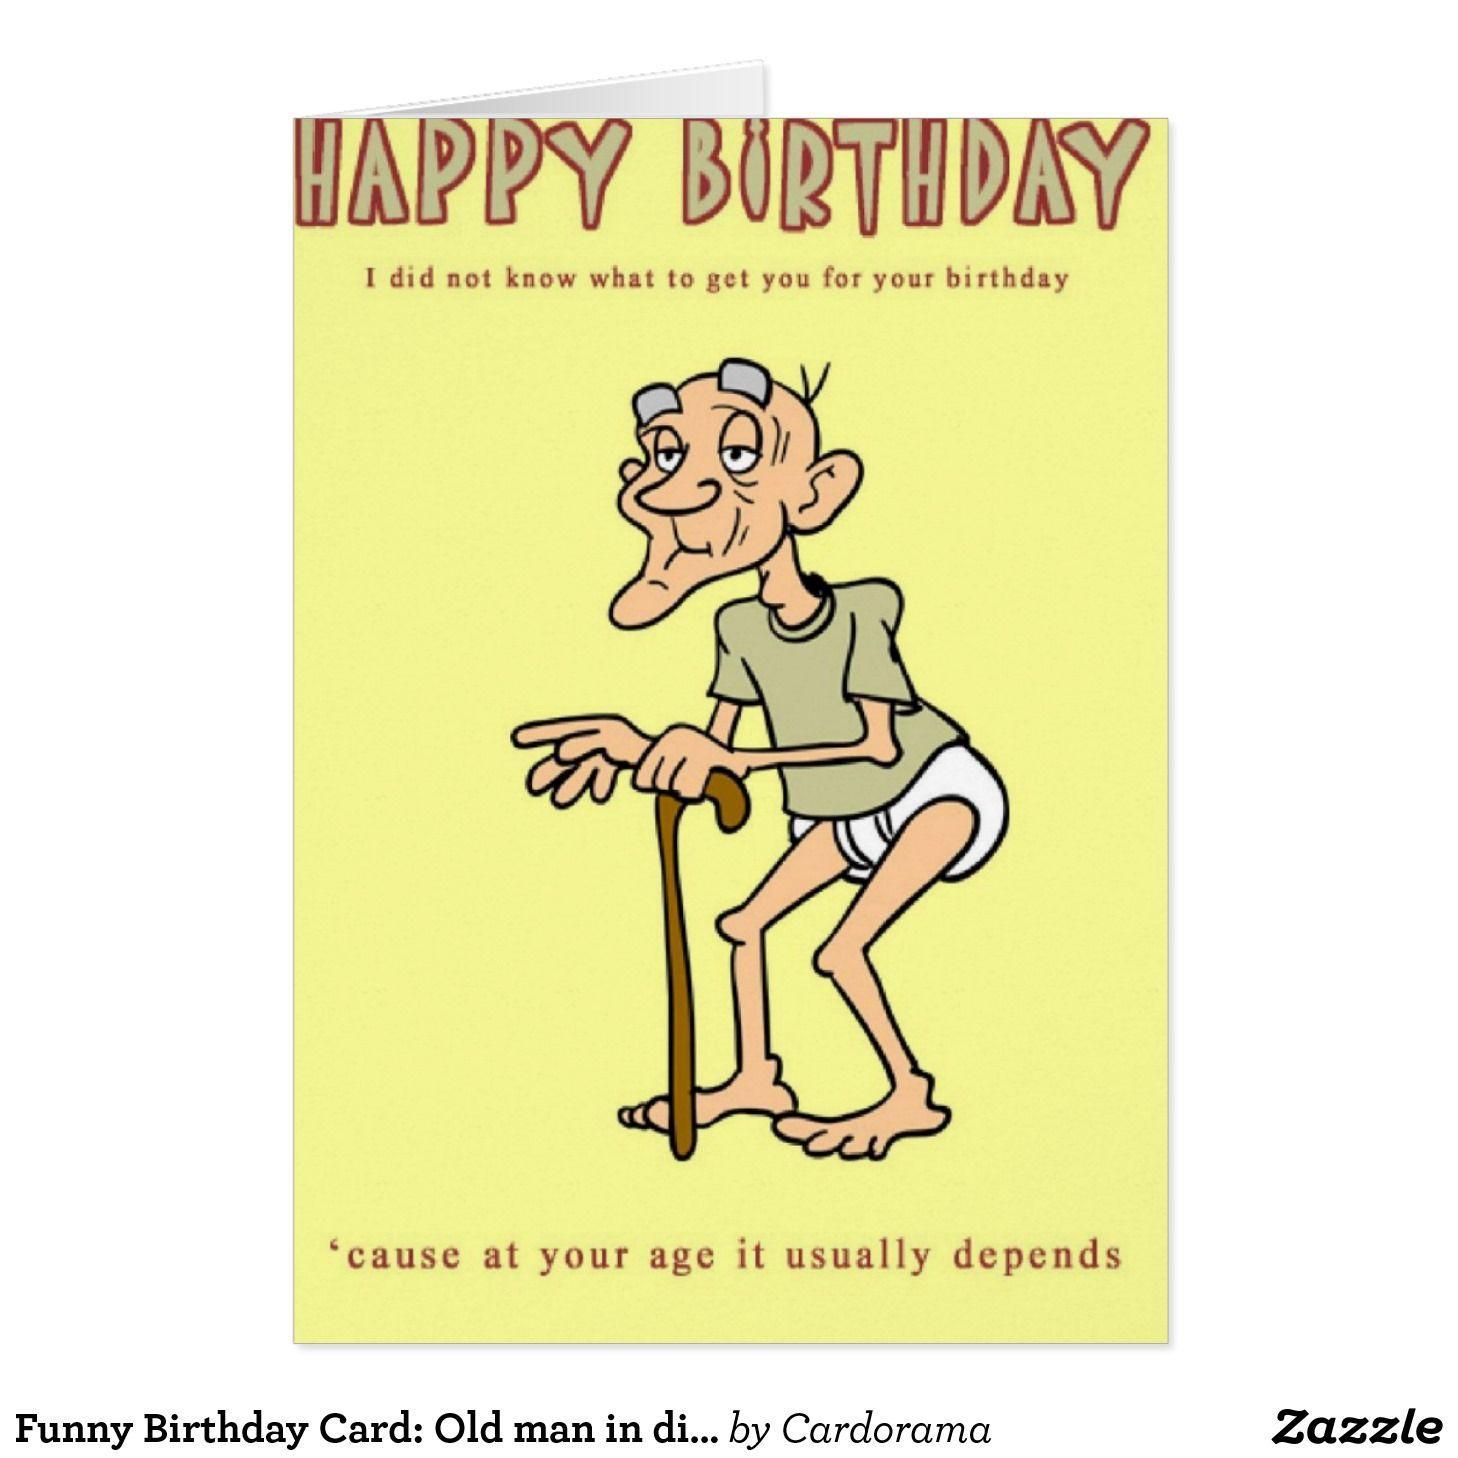 Funny Birthday Card Old Man In Diapers Card Zazzle Com In 2021 Birthday Jokes Birthday Humor Happy Birthday Quotes Funny